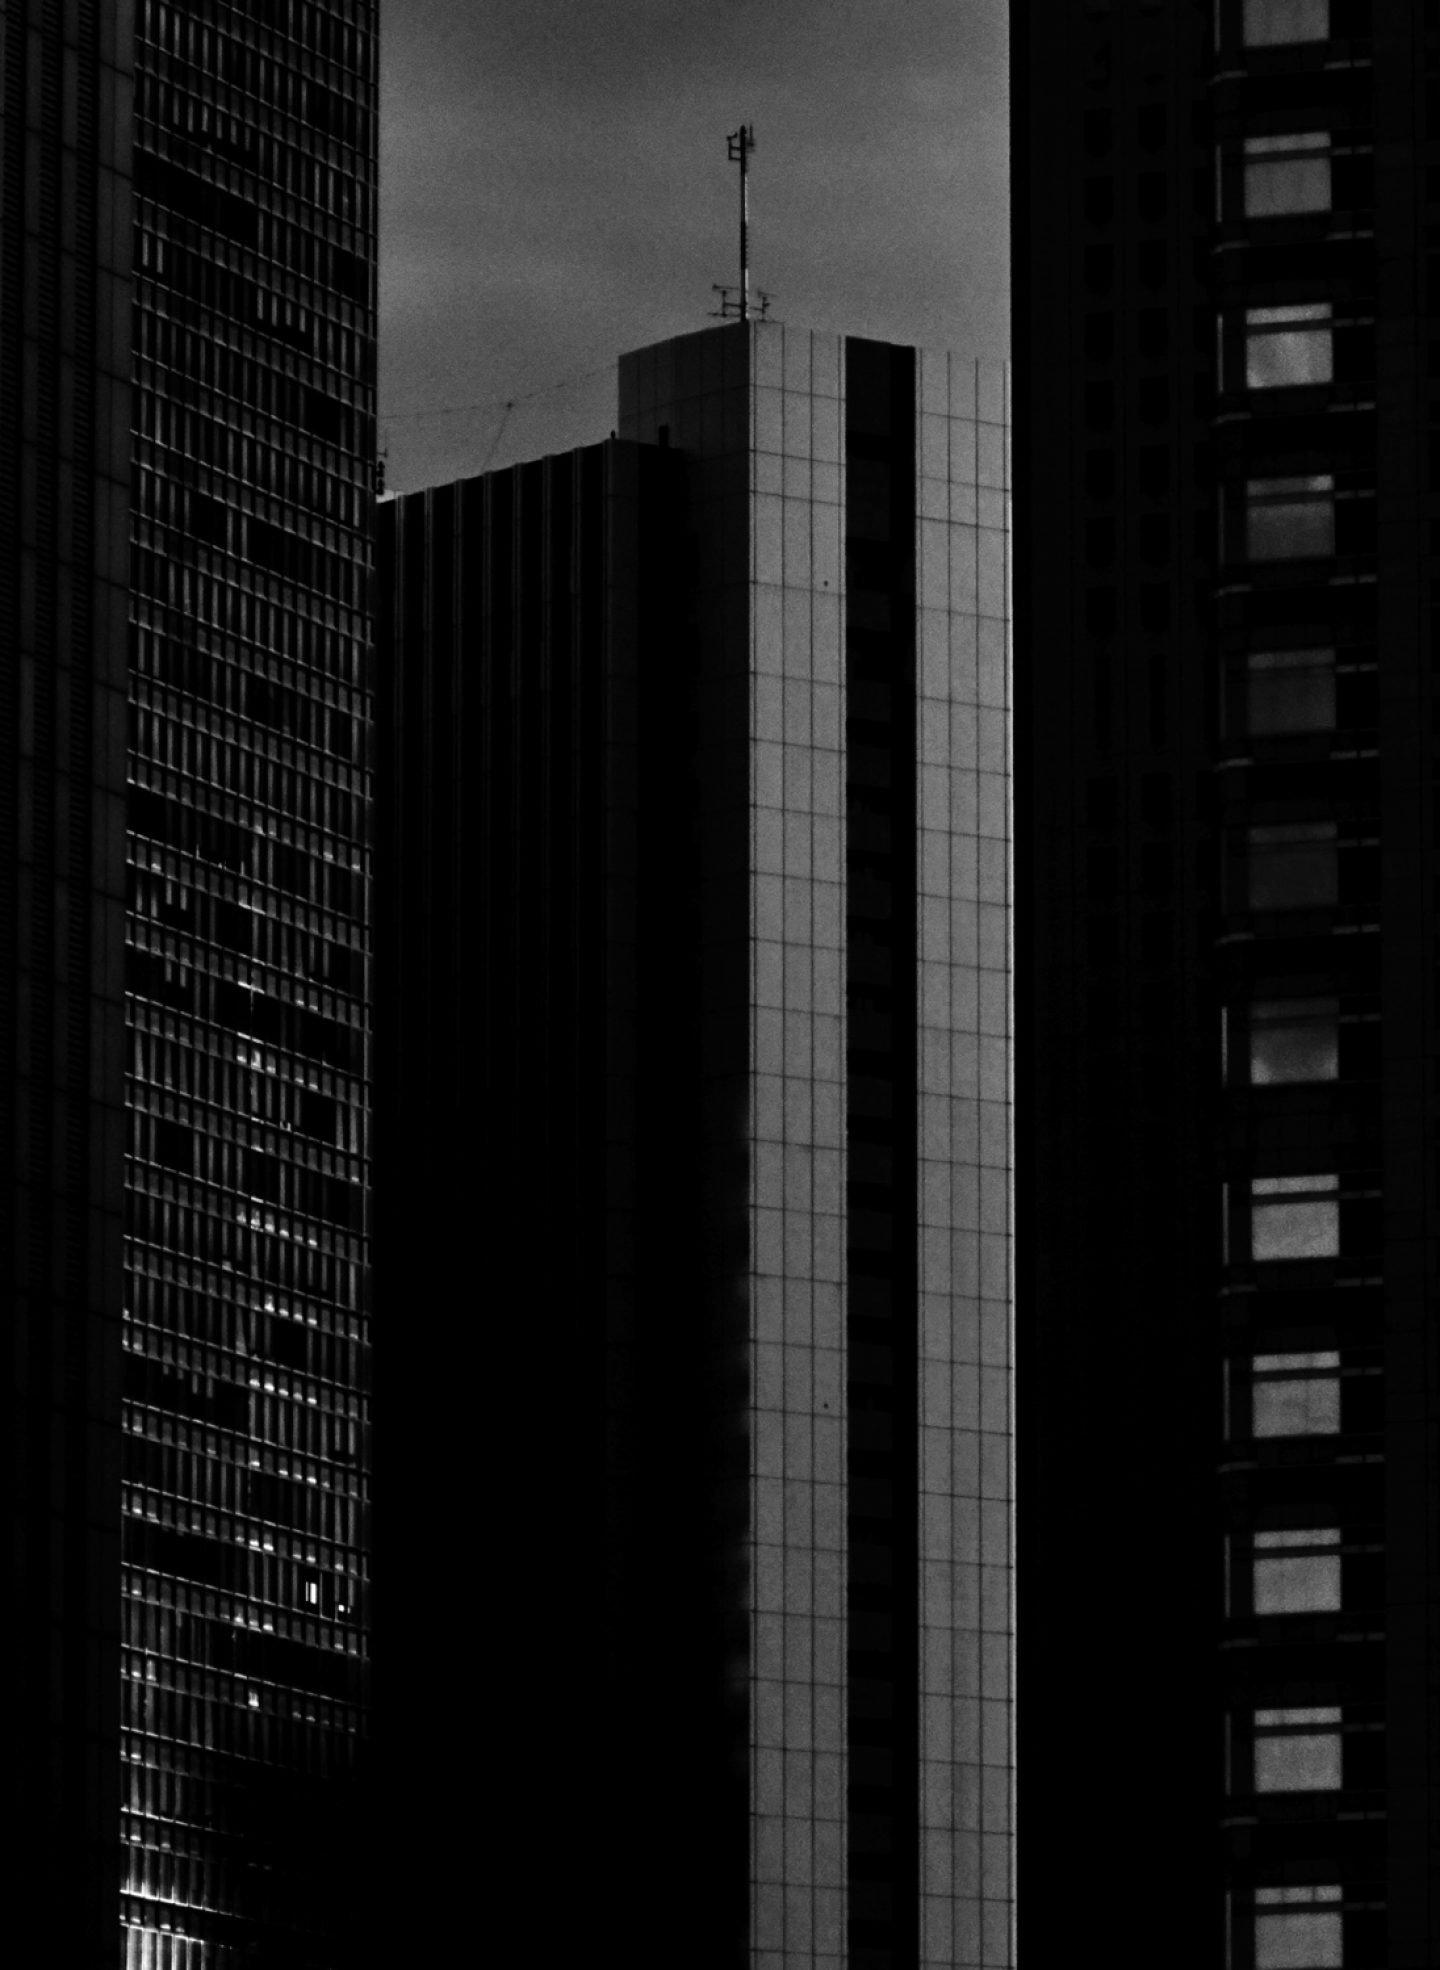 IGNANT-Photography-Jack-Davison-Recent-024